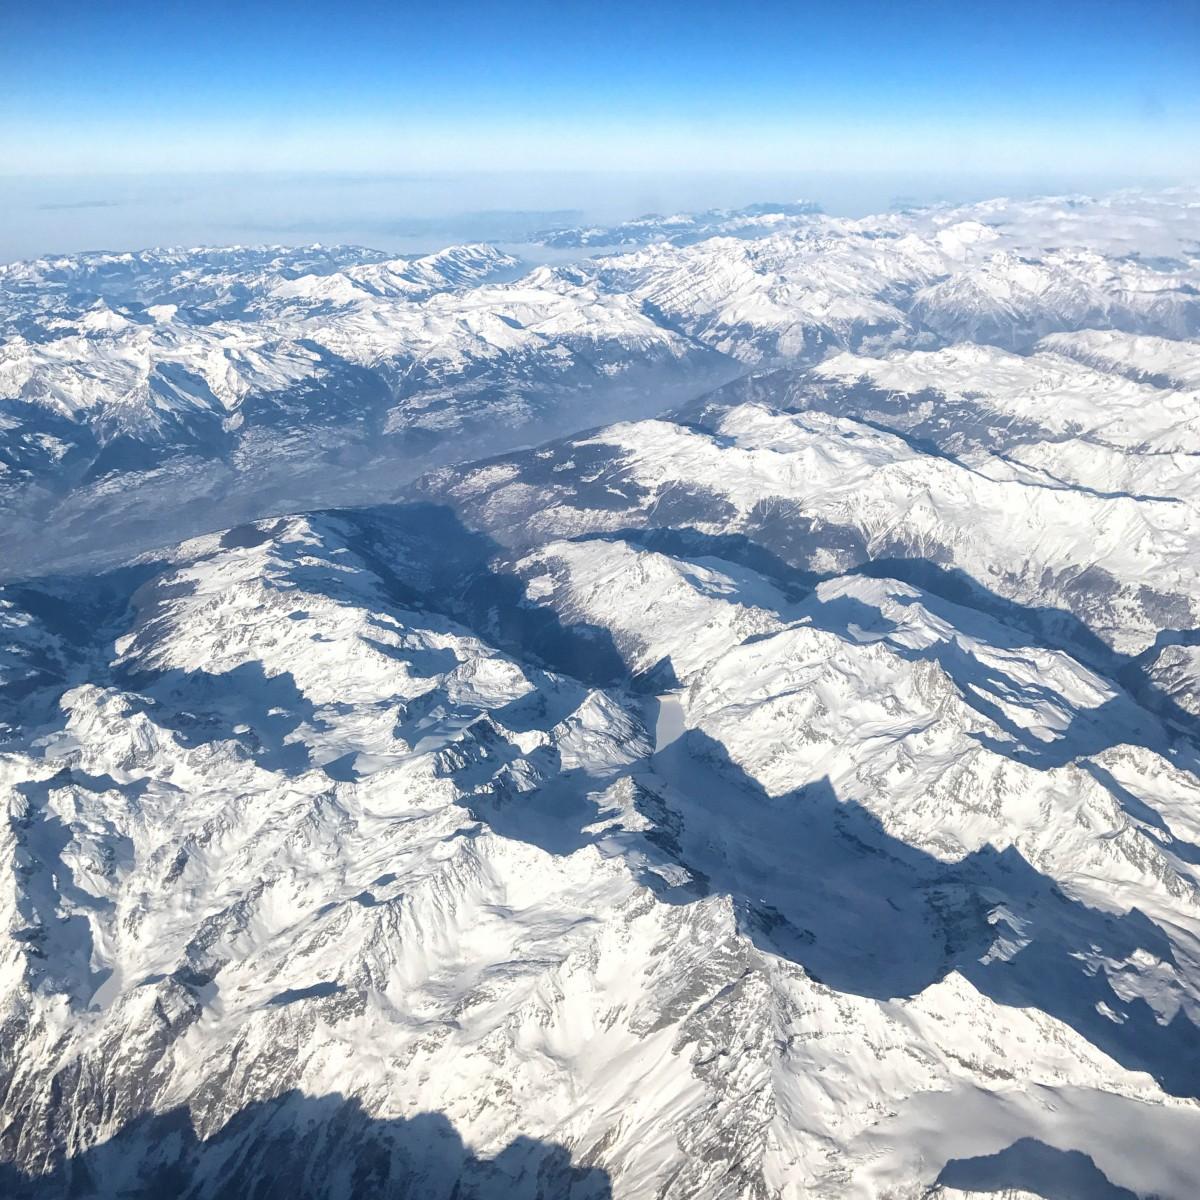 South Tyrol Skiing Alps Scenery